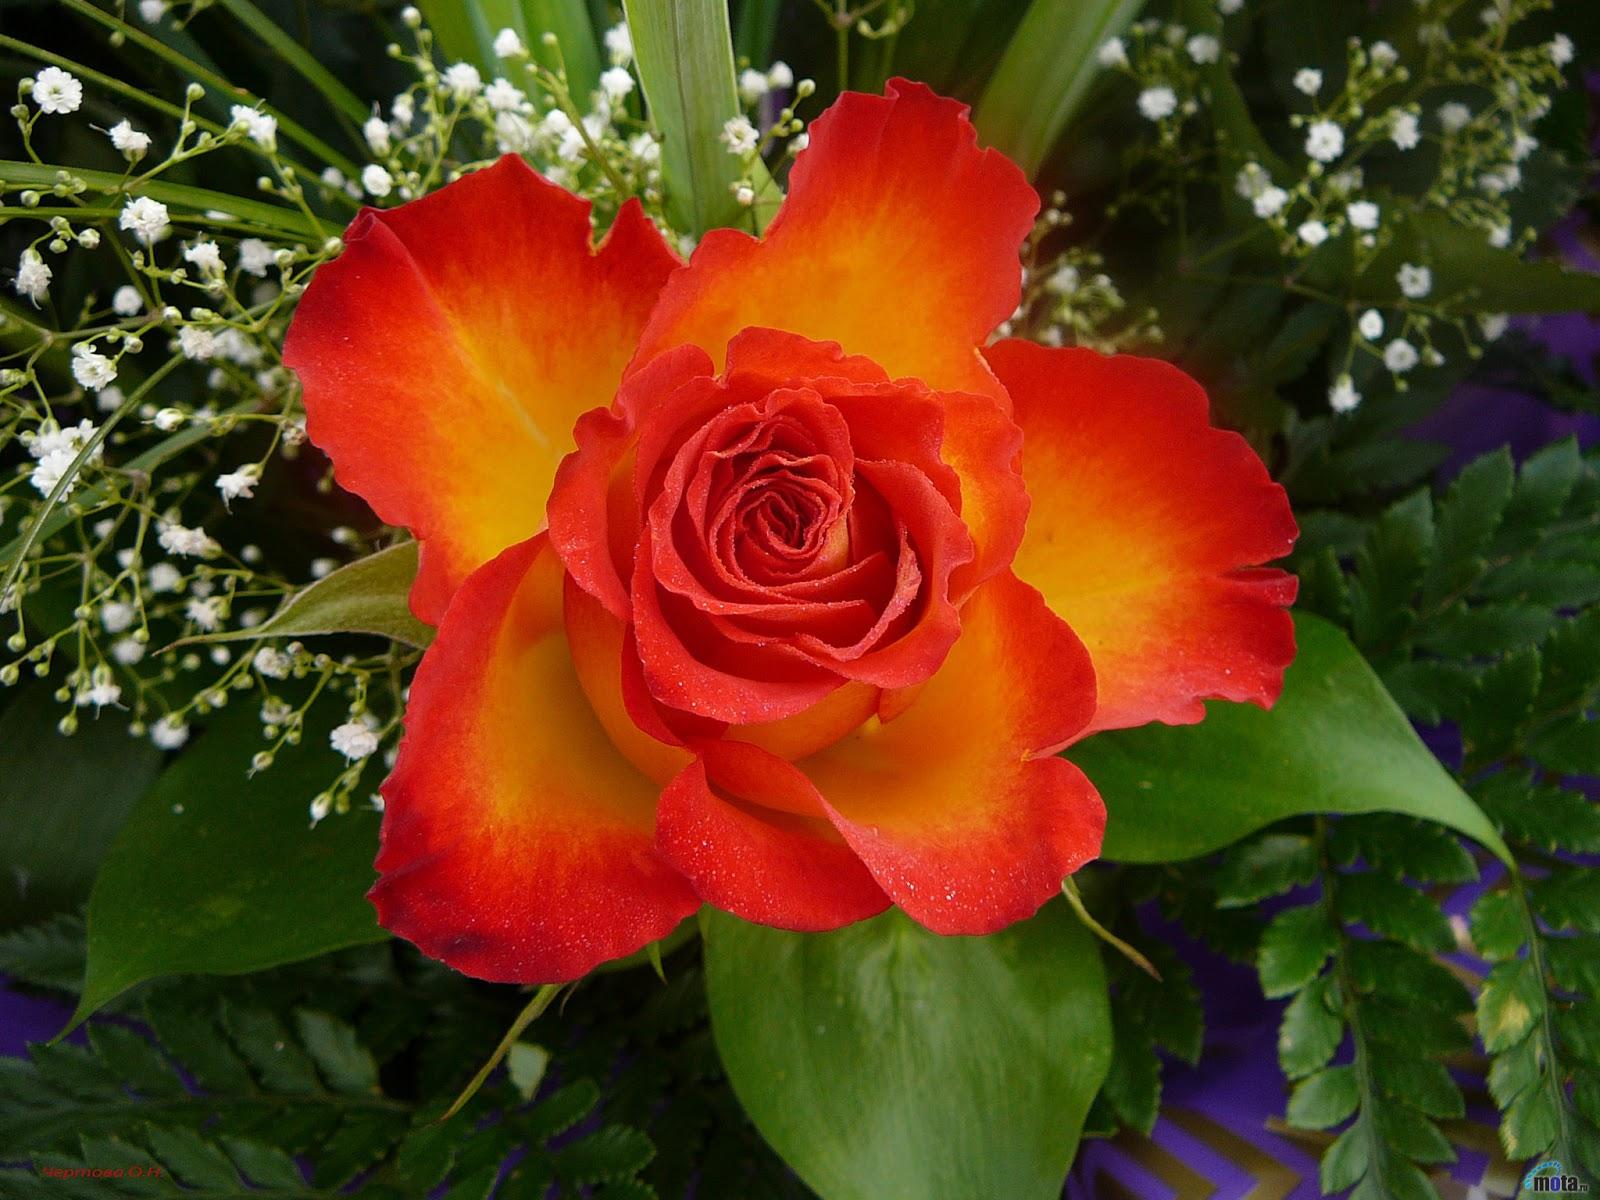 Noticias de ambato flores hermosas - Rosas rosas hermosas ...